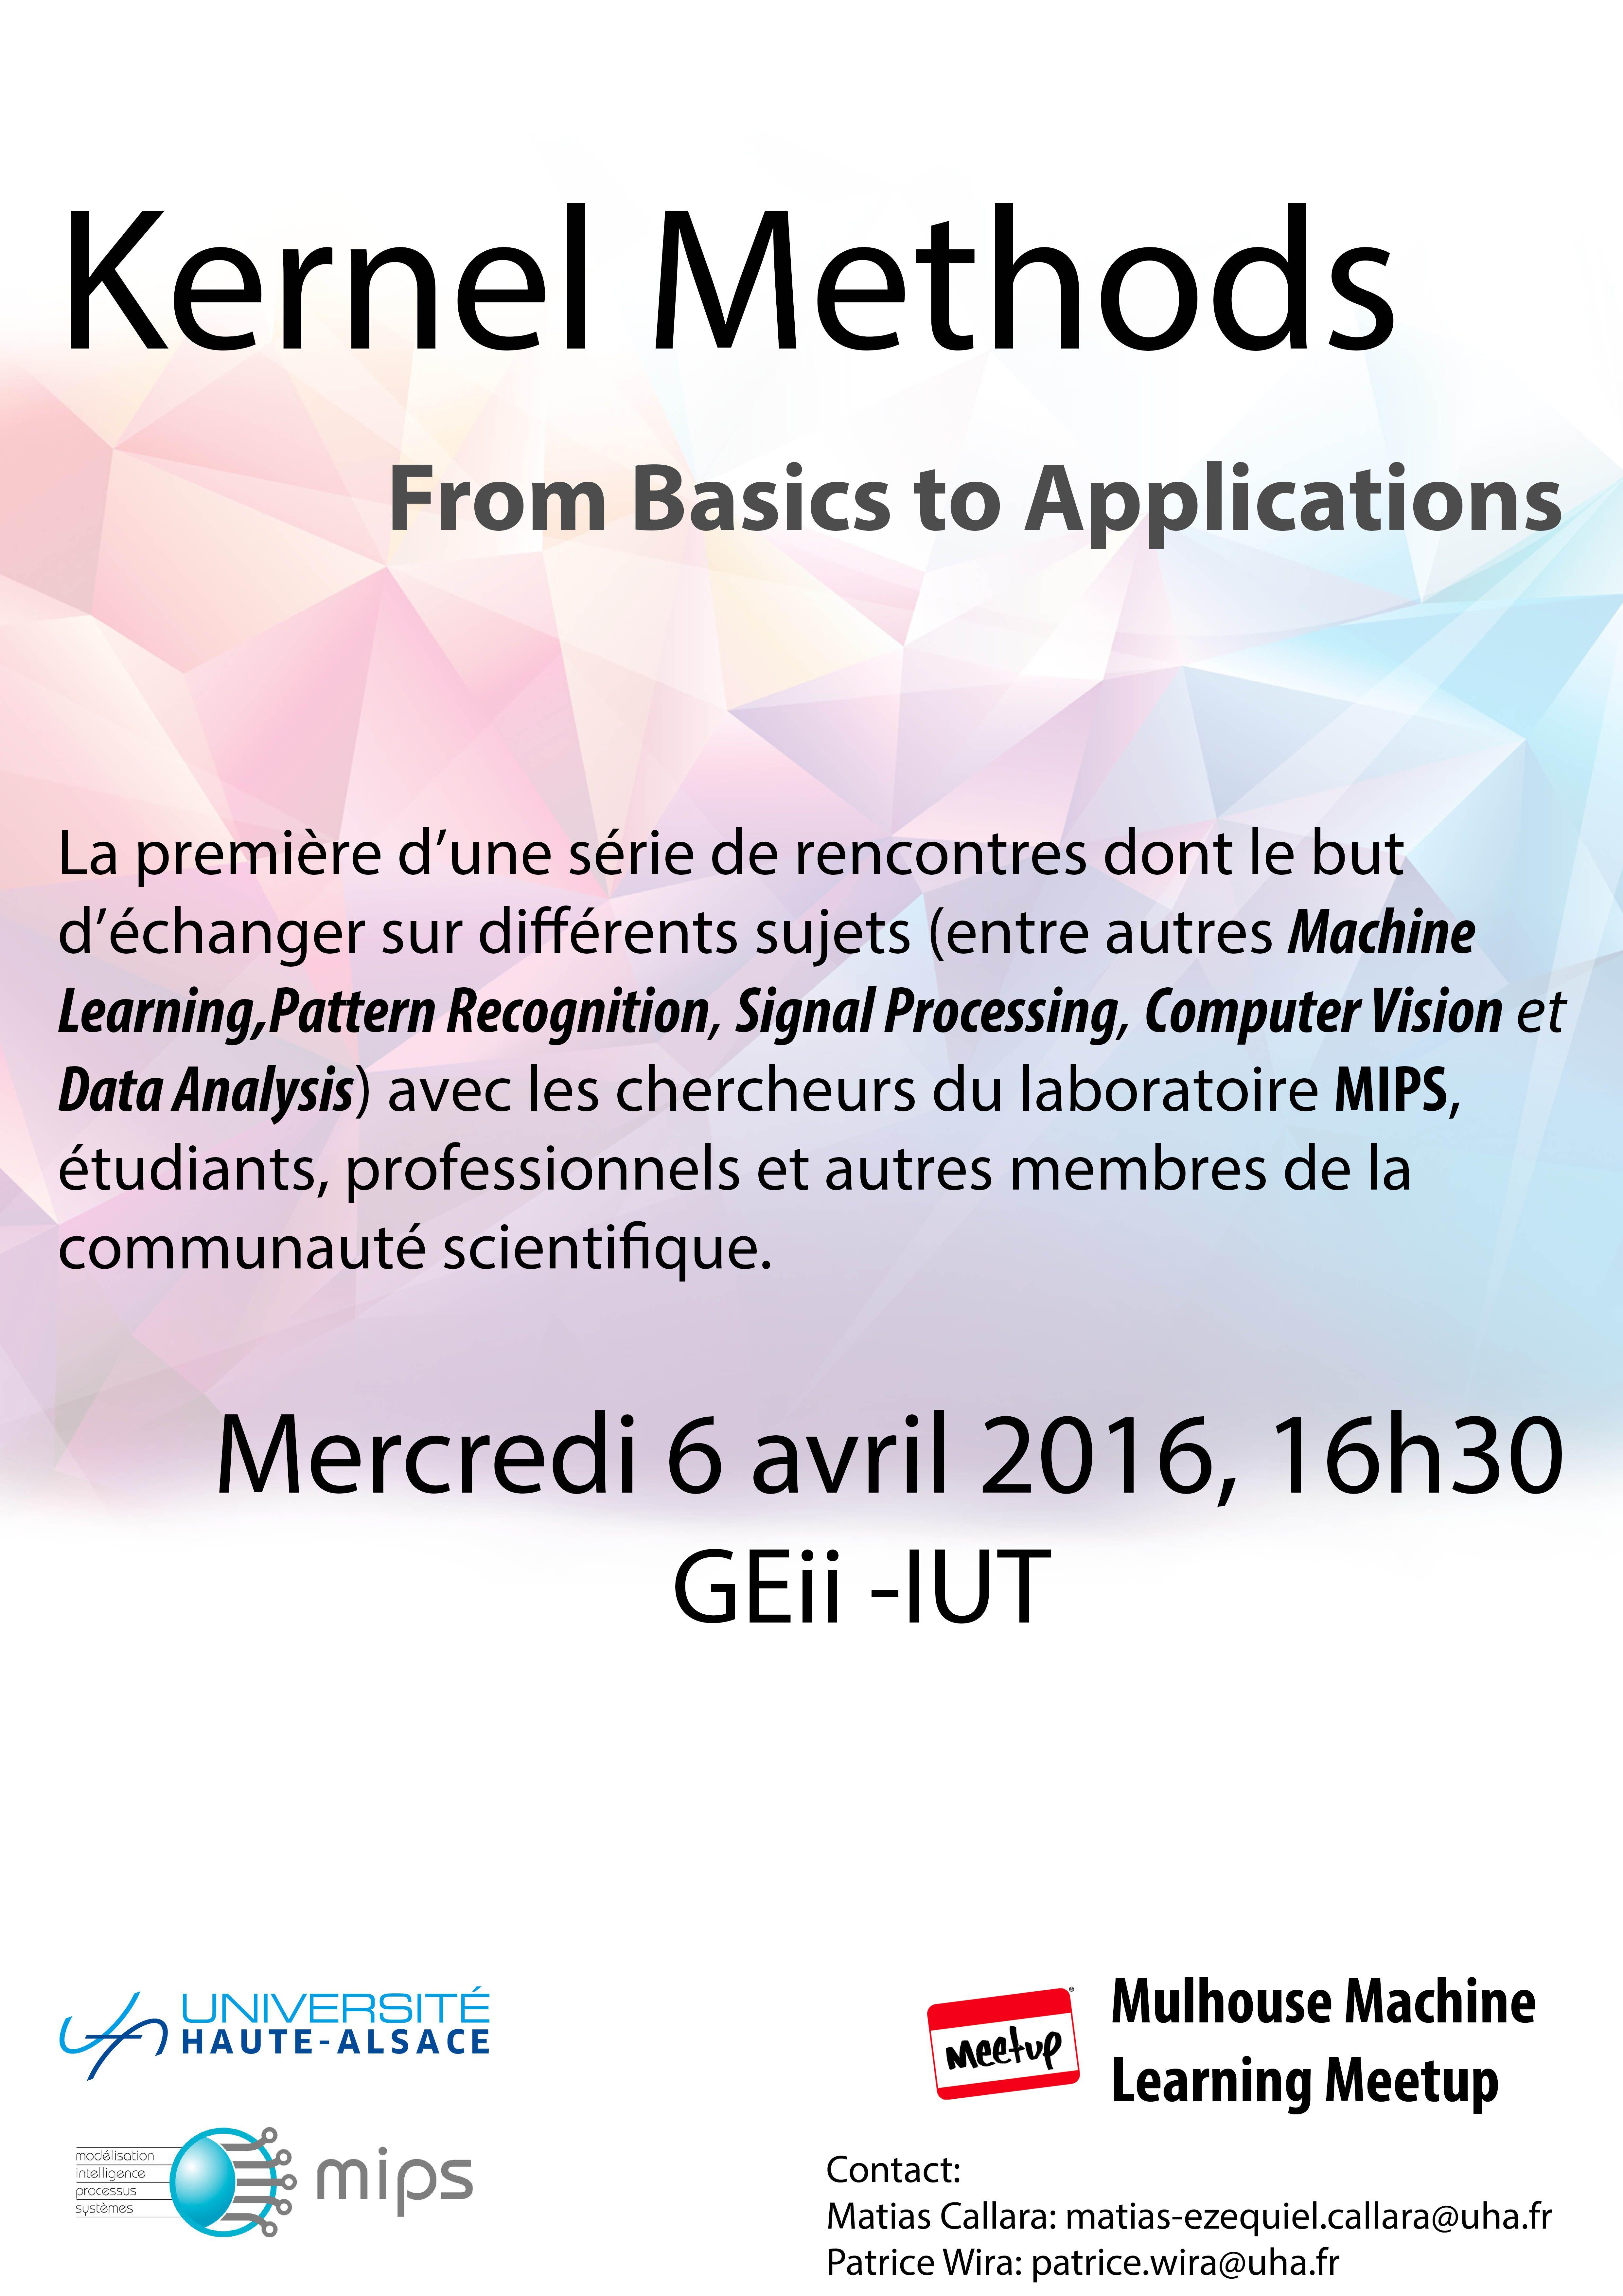 Mulhouse Machine Learning Meetup